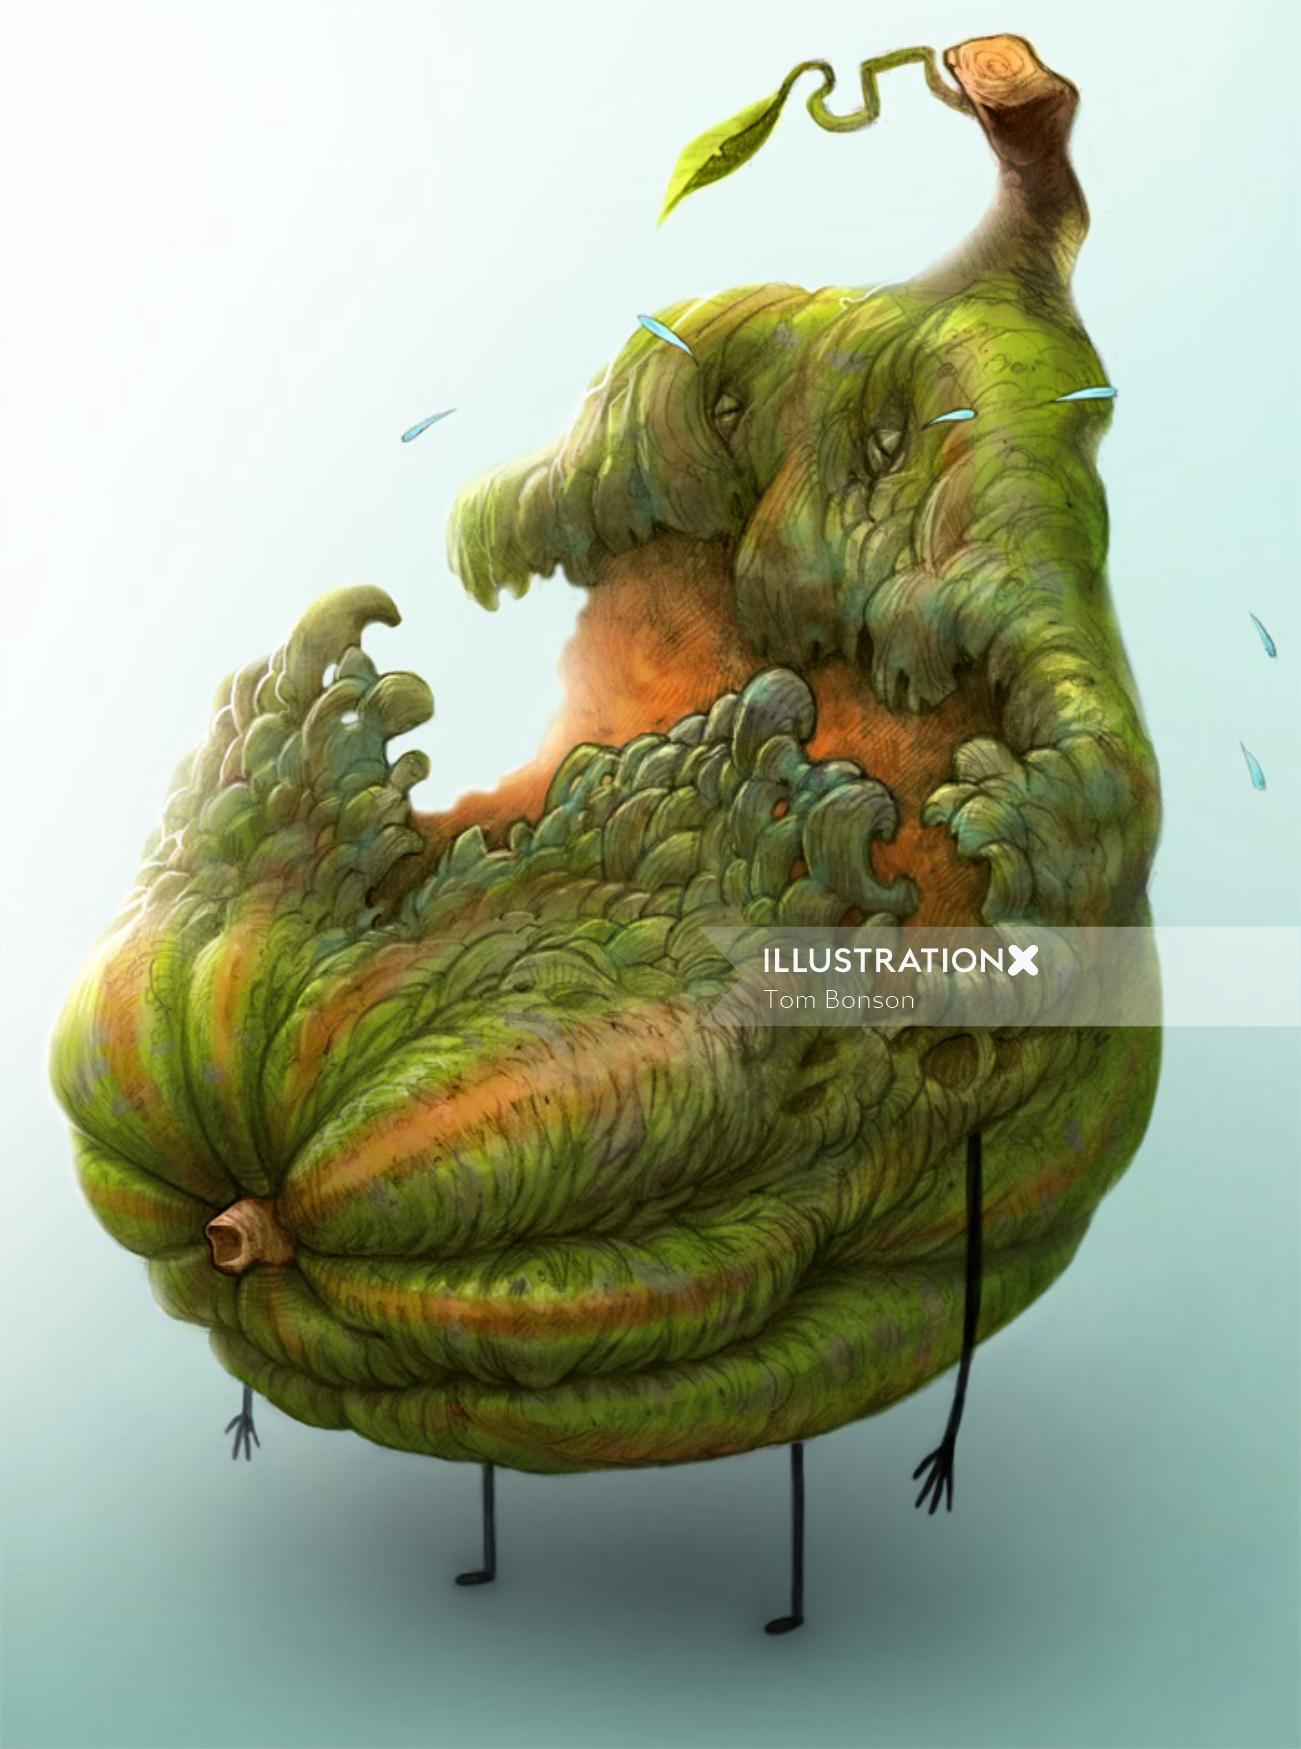 Cartoon & Humor of a fruit